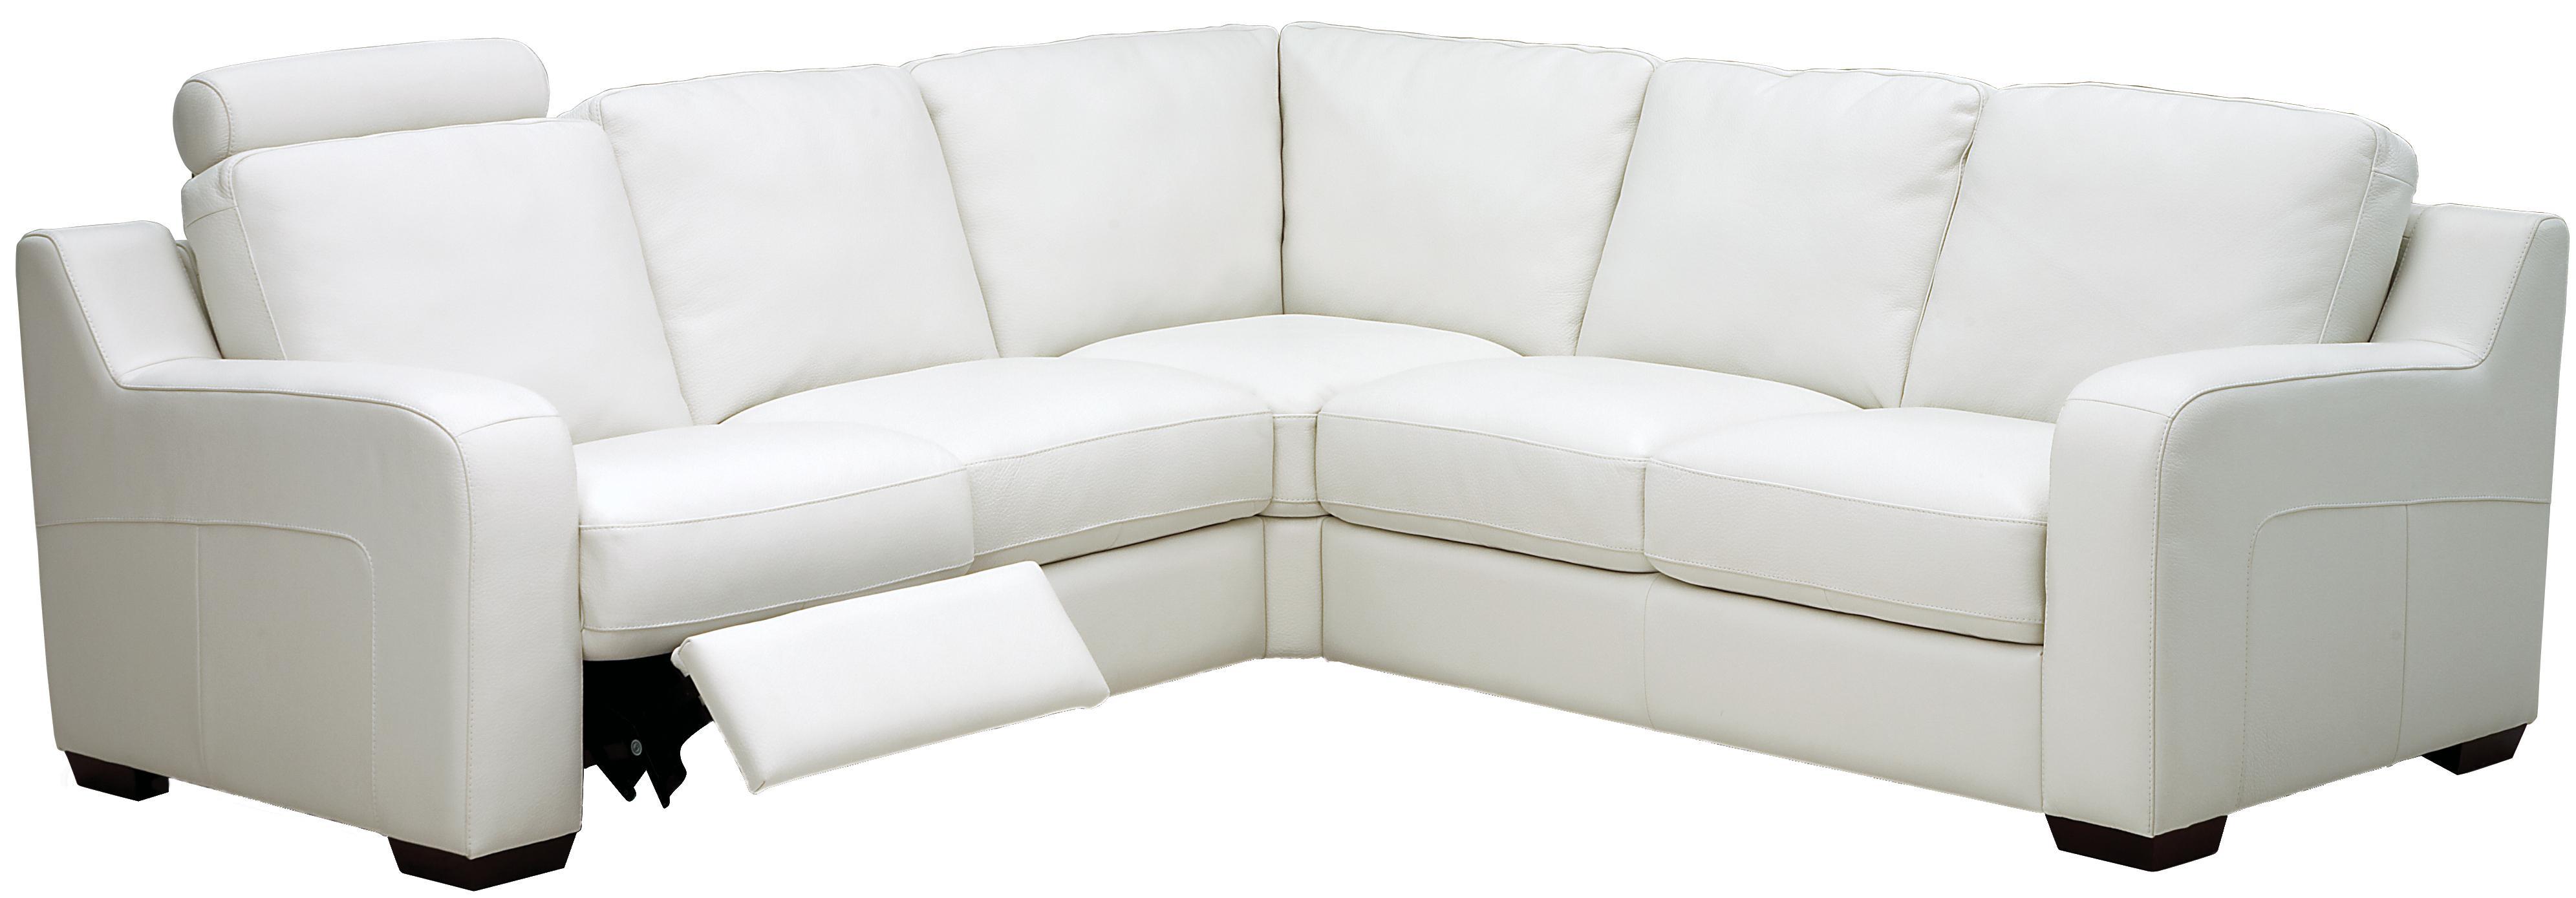 Flex Reclining Sectional Sofa by Palliser at Jordan's Home Furnishings